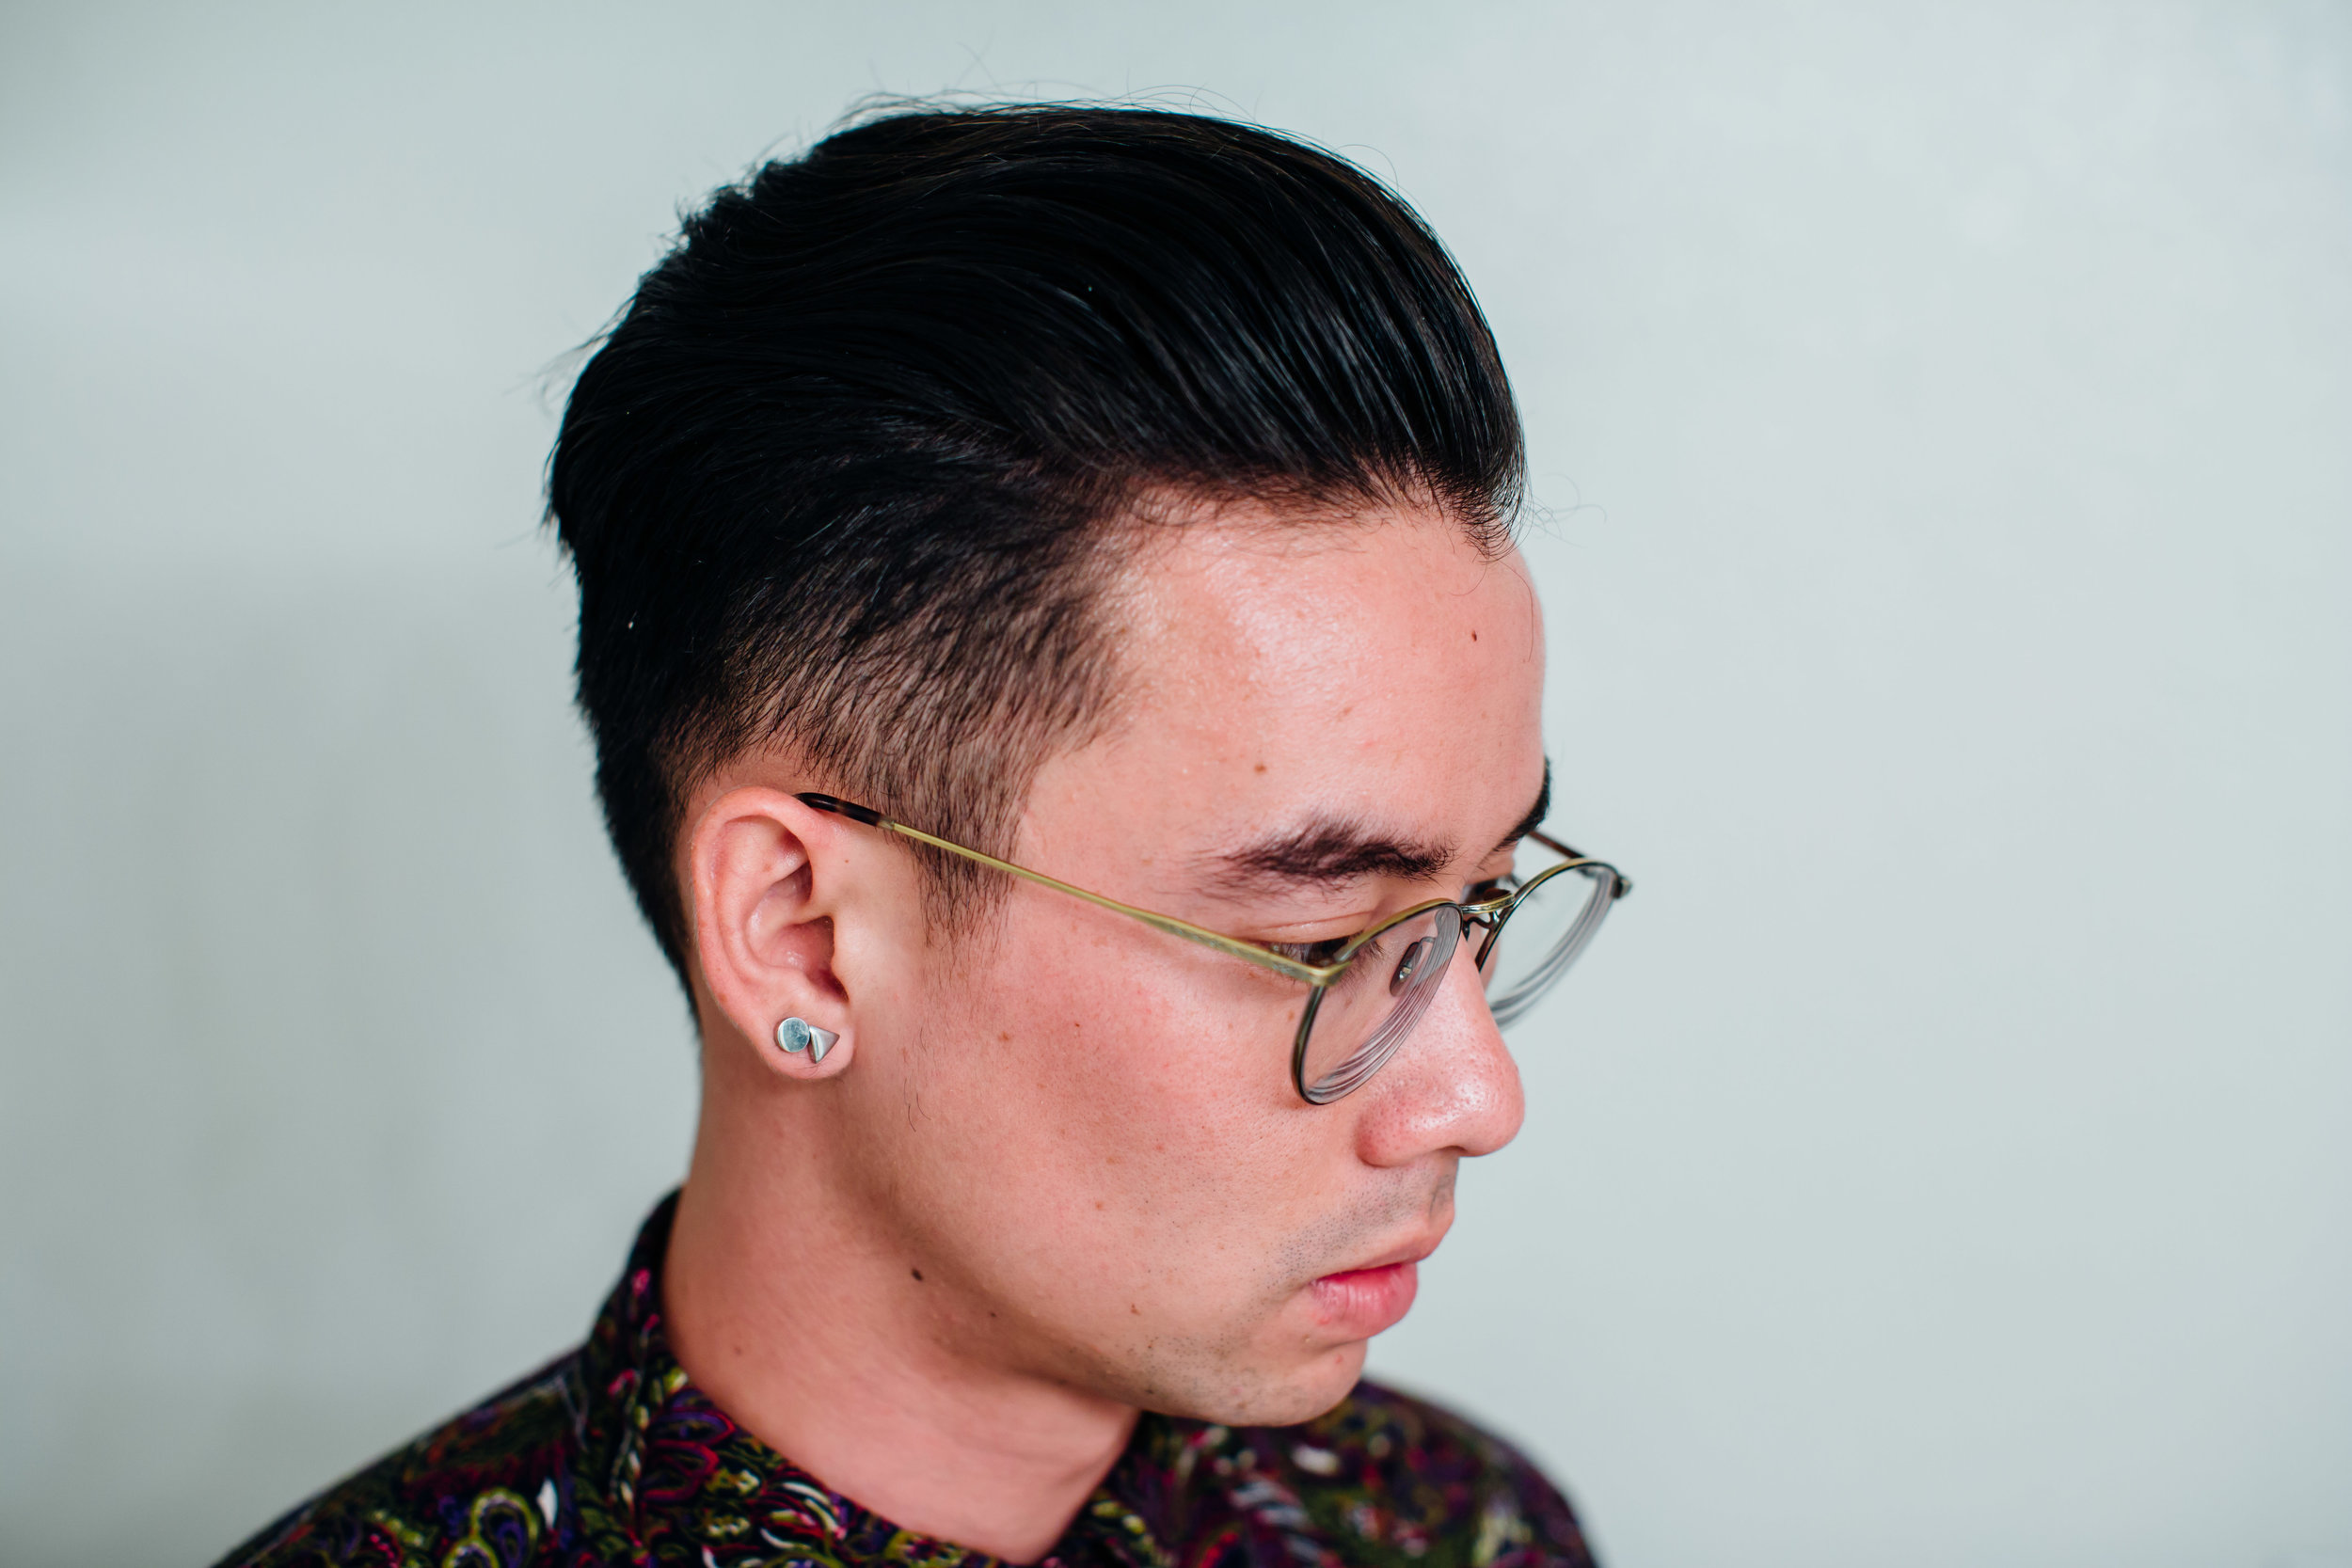 Hairbond Shaper - Hairstyle Slick